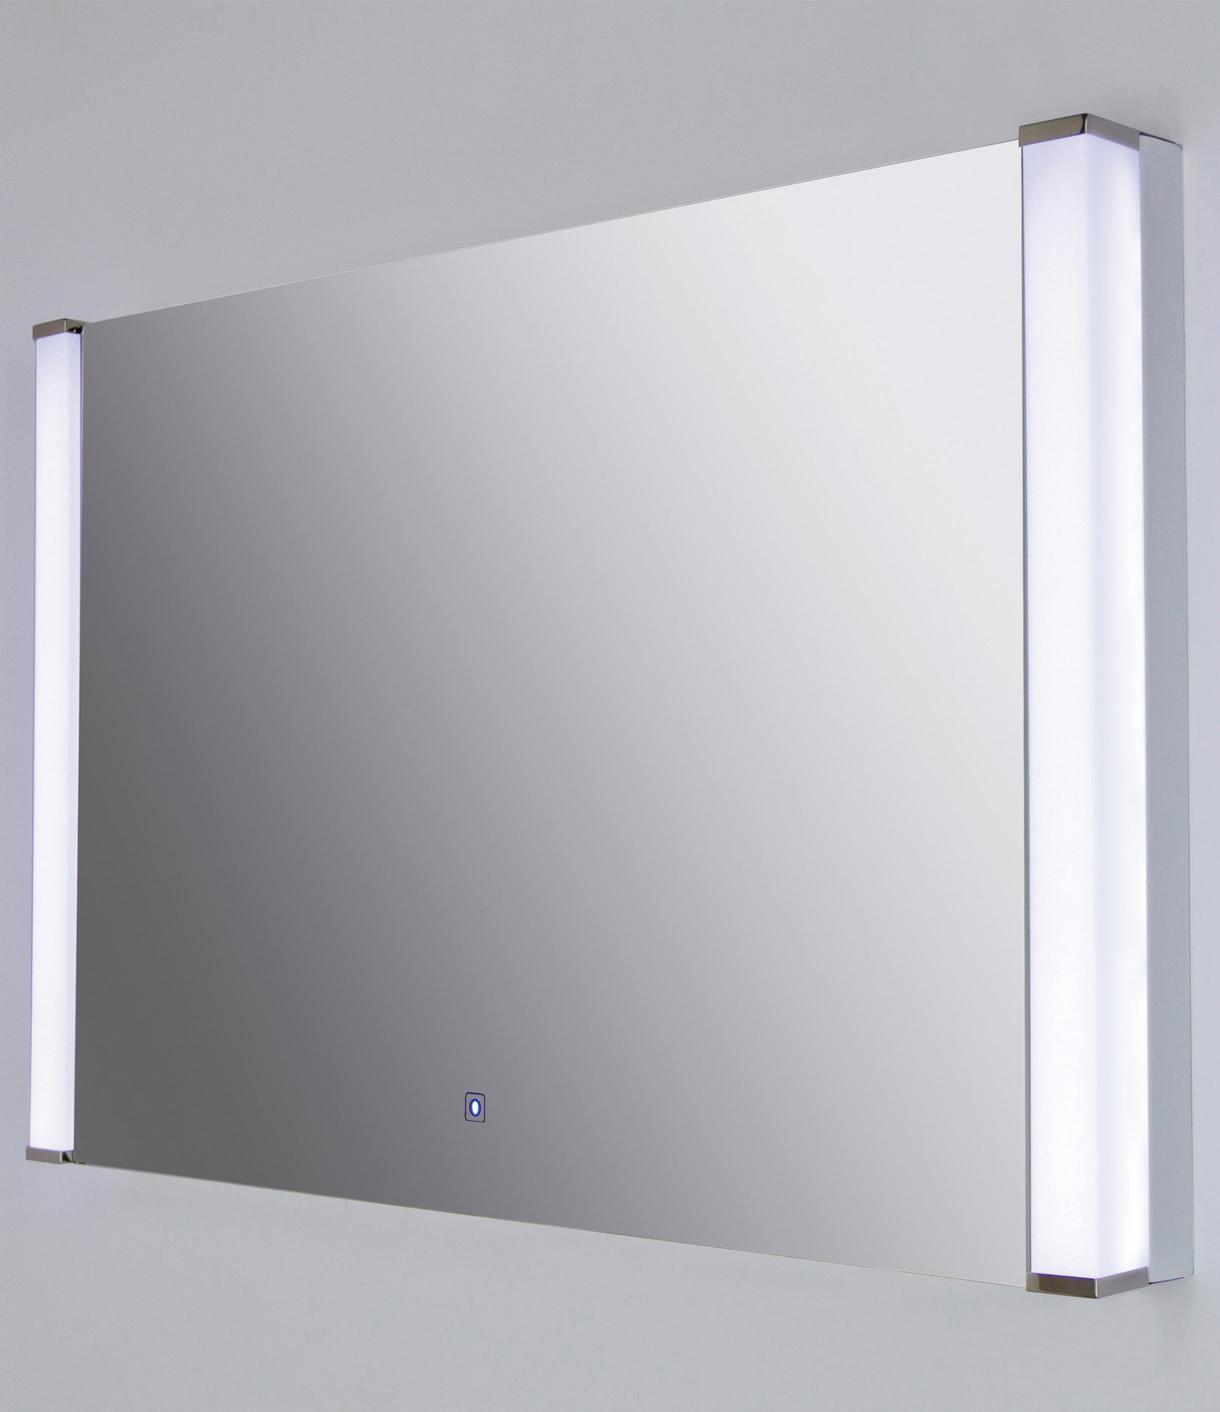 RAK Luminere 775 x 500mm White Framed Bathroom Mirror